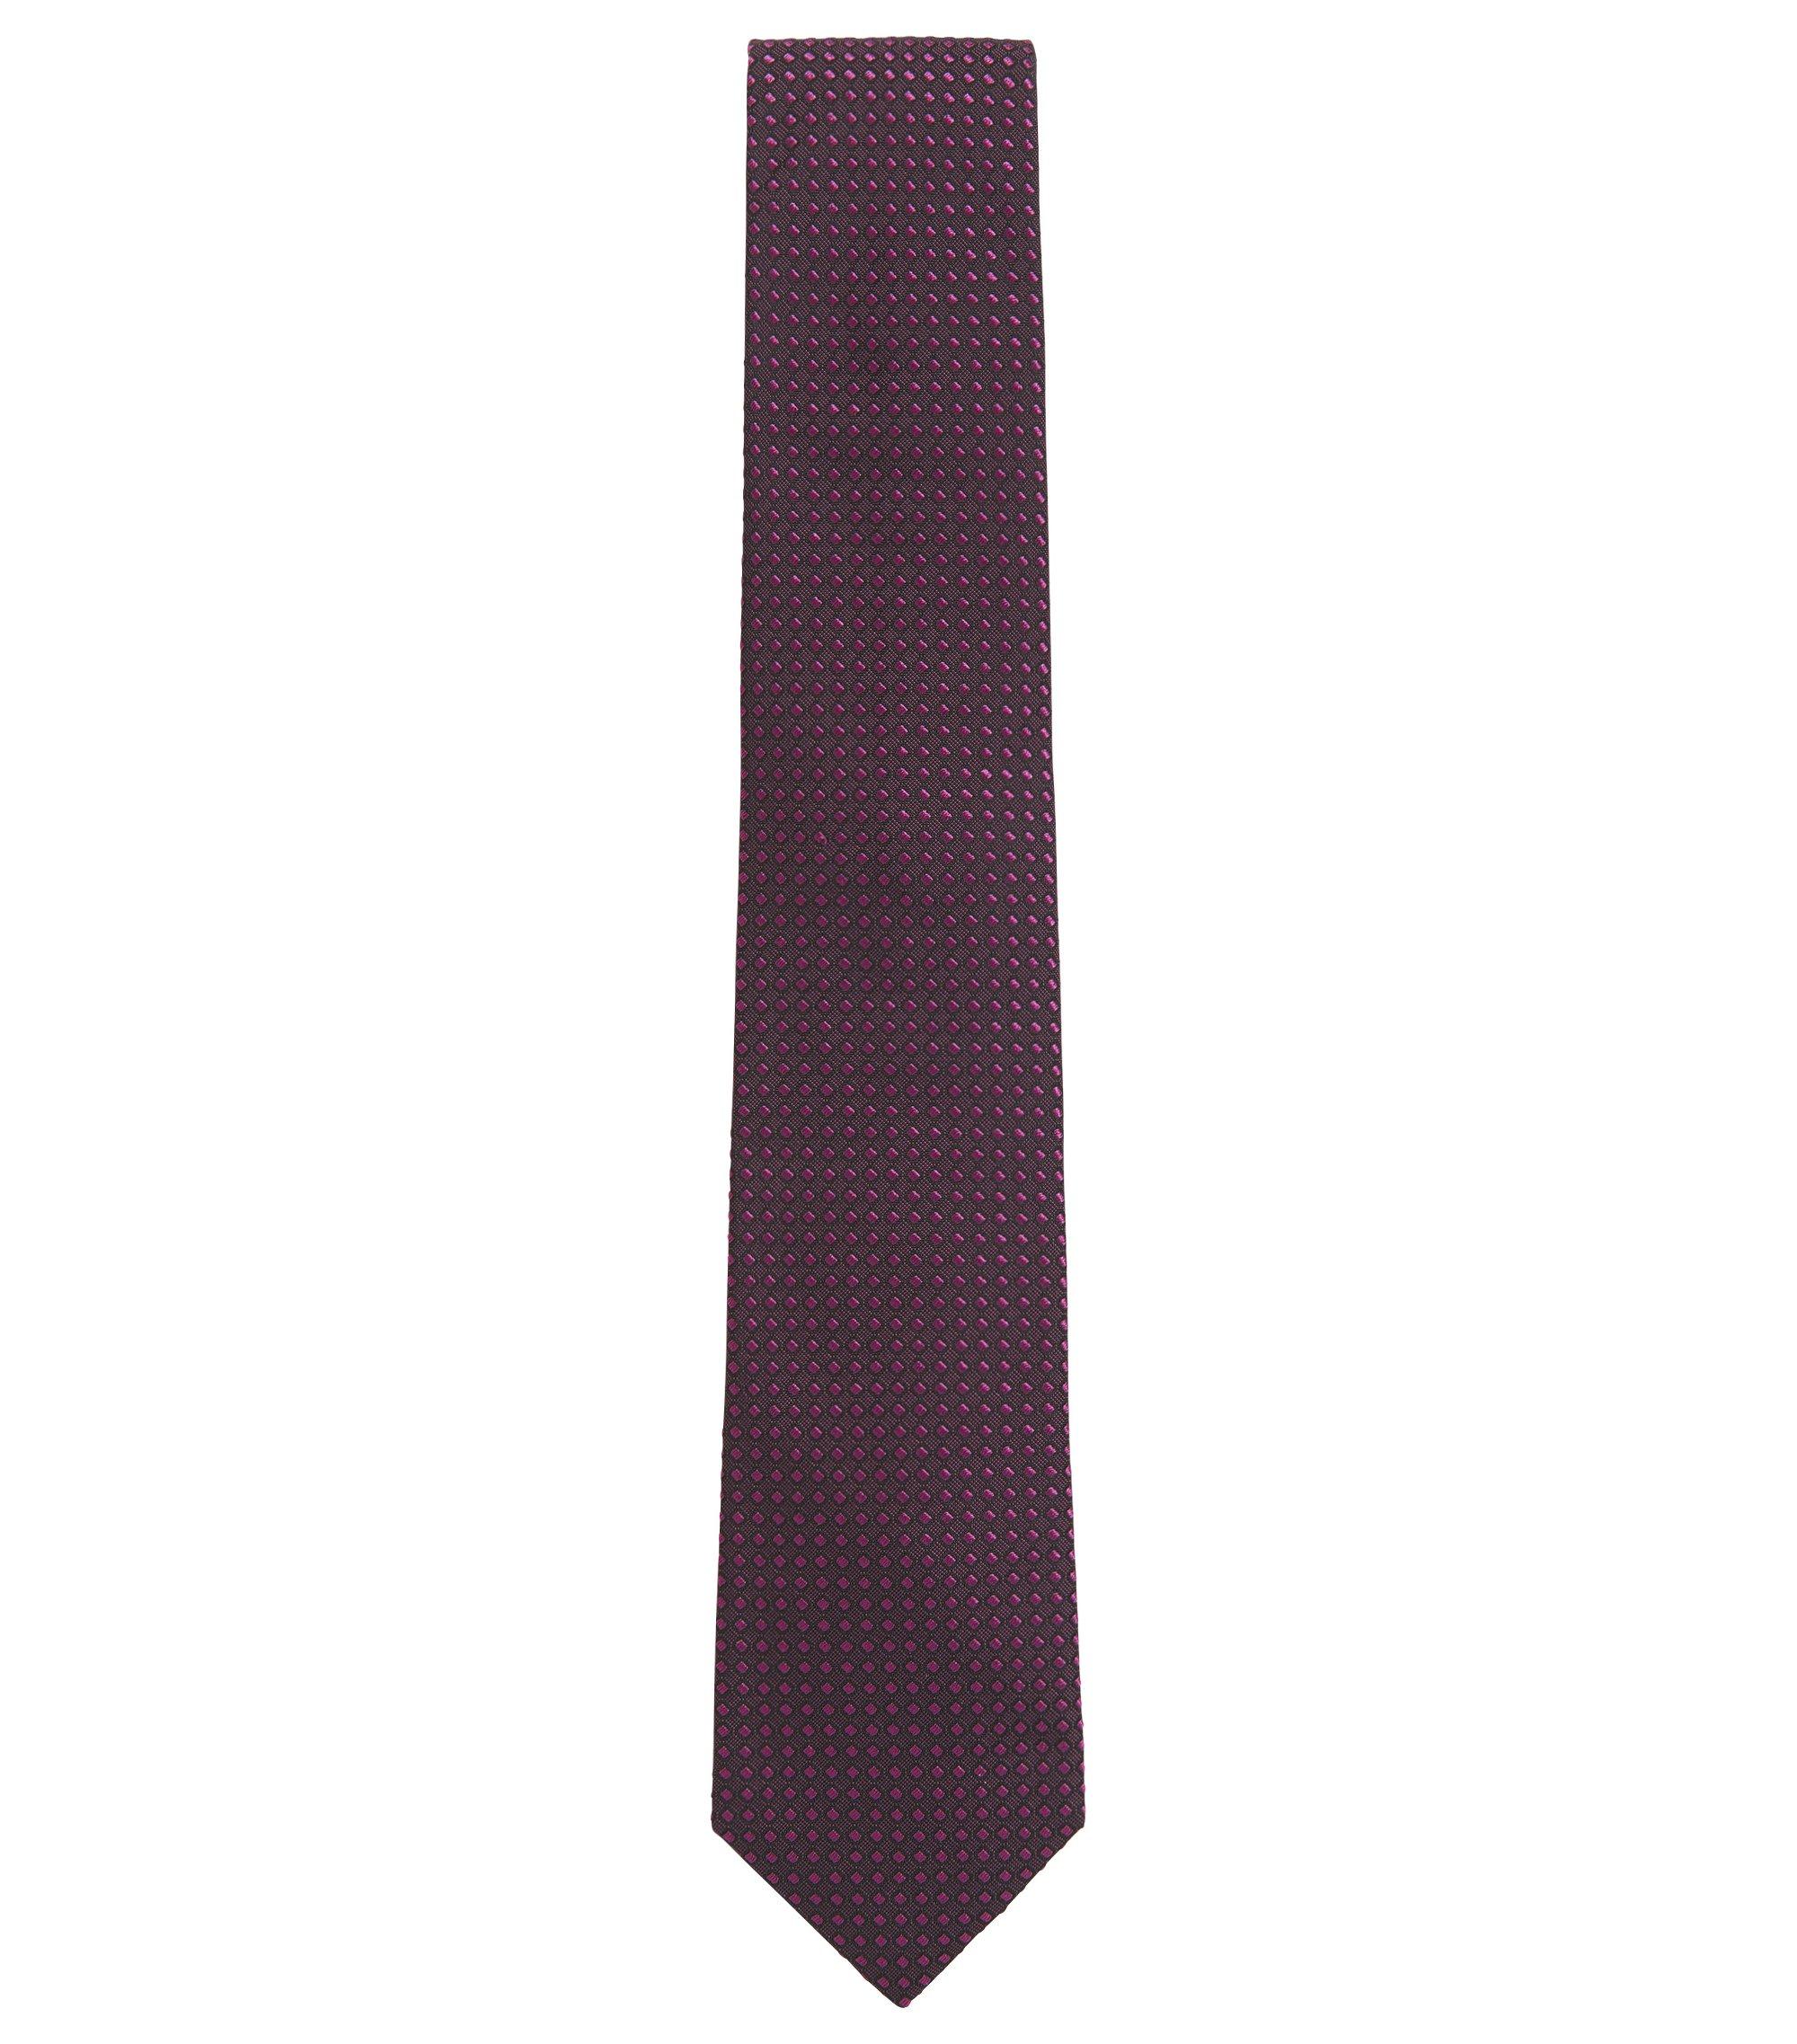 Ton in Ton gemusterte Krawatte aus Seiden-Jacquard, Dunkelrosa